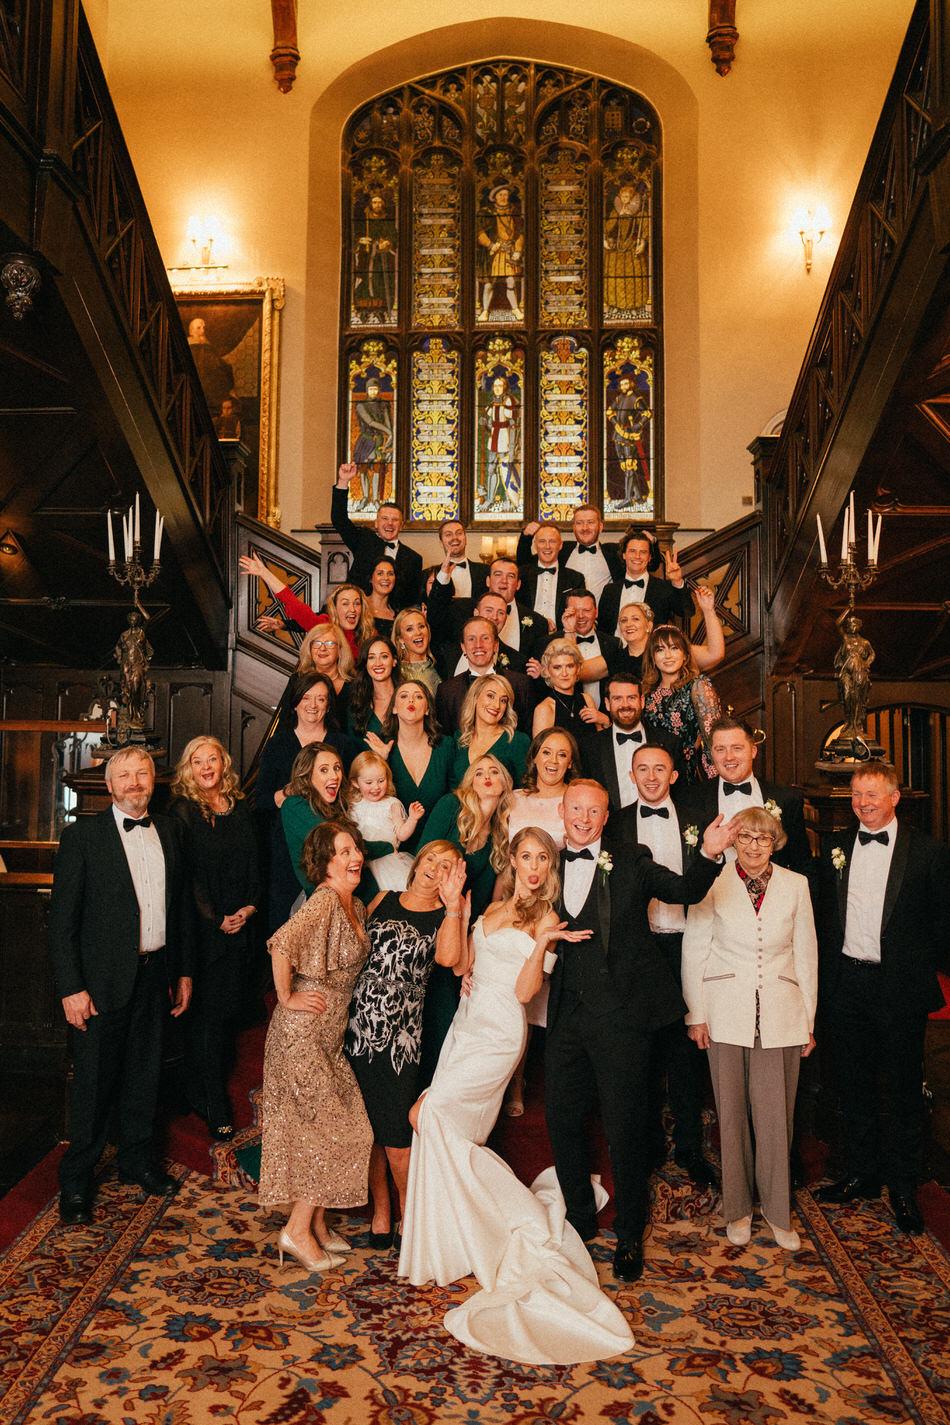 Castle-wedding-ireland-photos- 0278 211